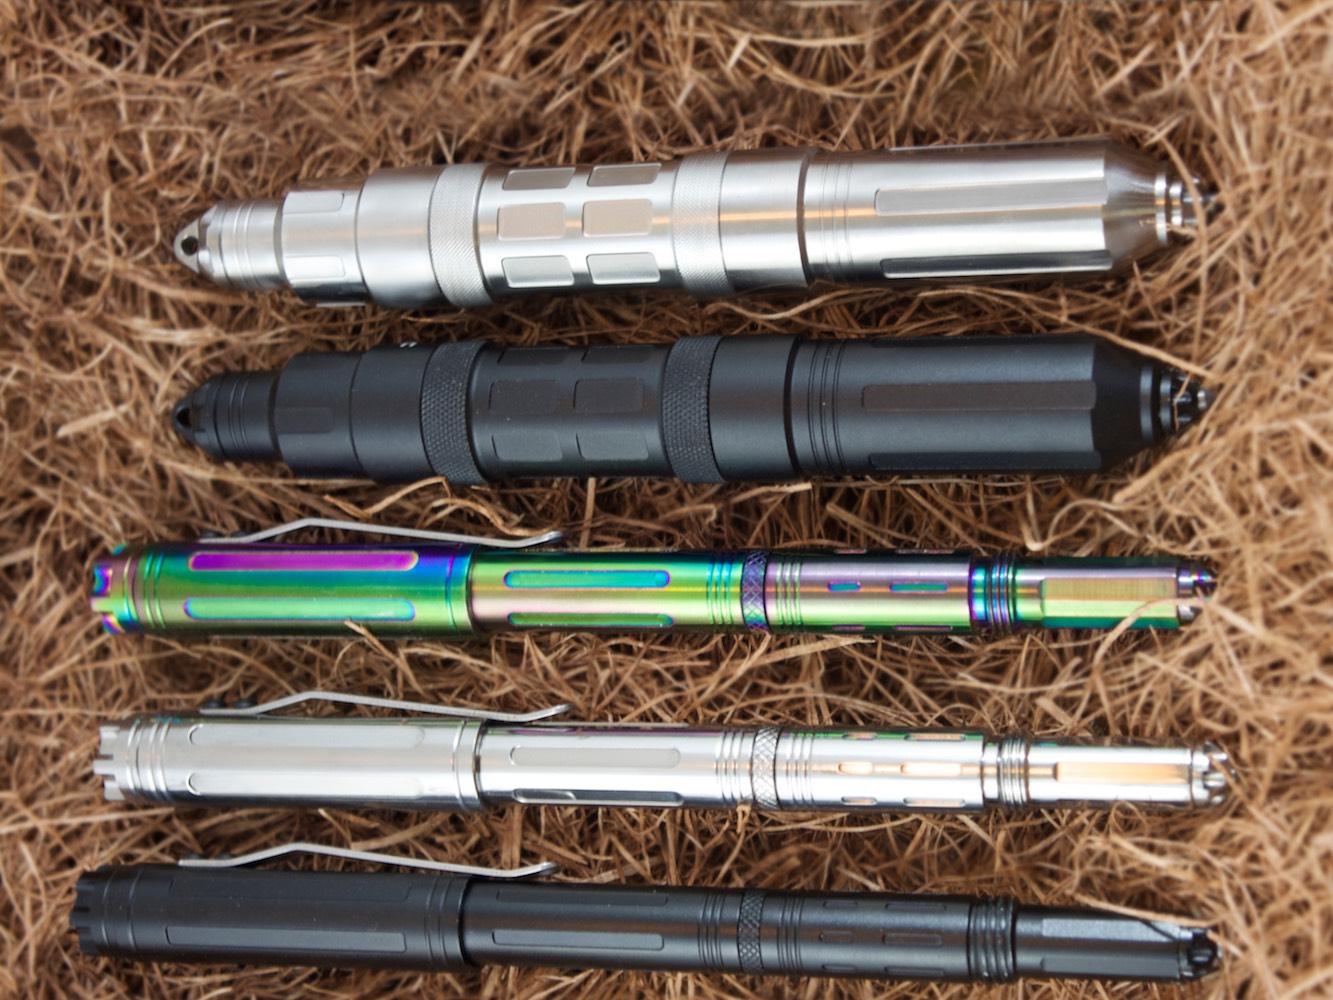 The Tactful (Tactical) Pen & Tool – A Unique EDC For Life